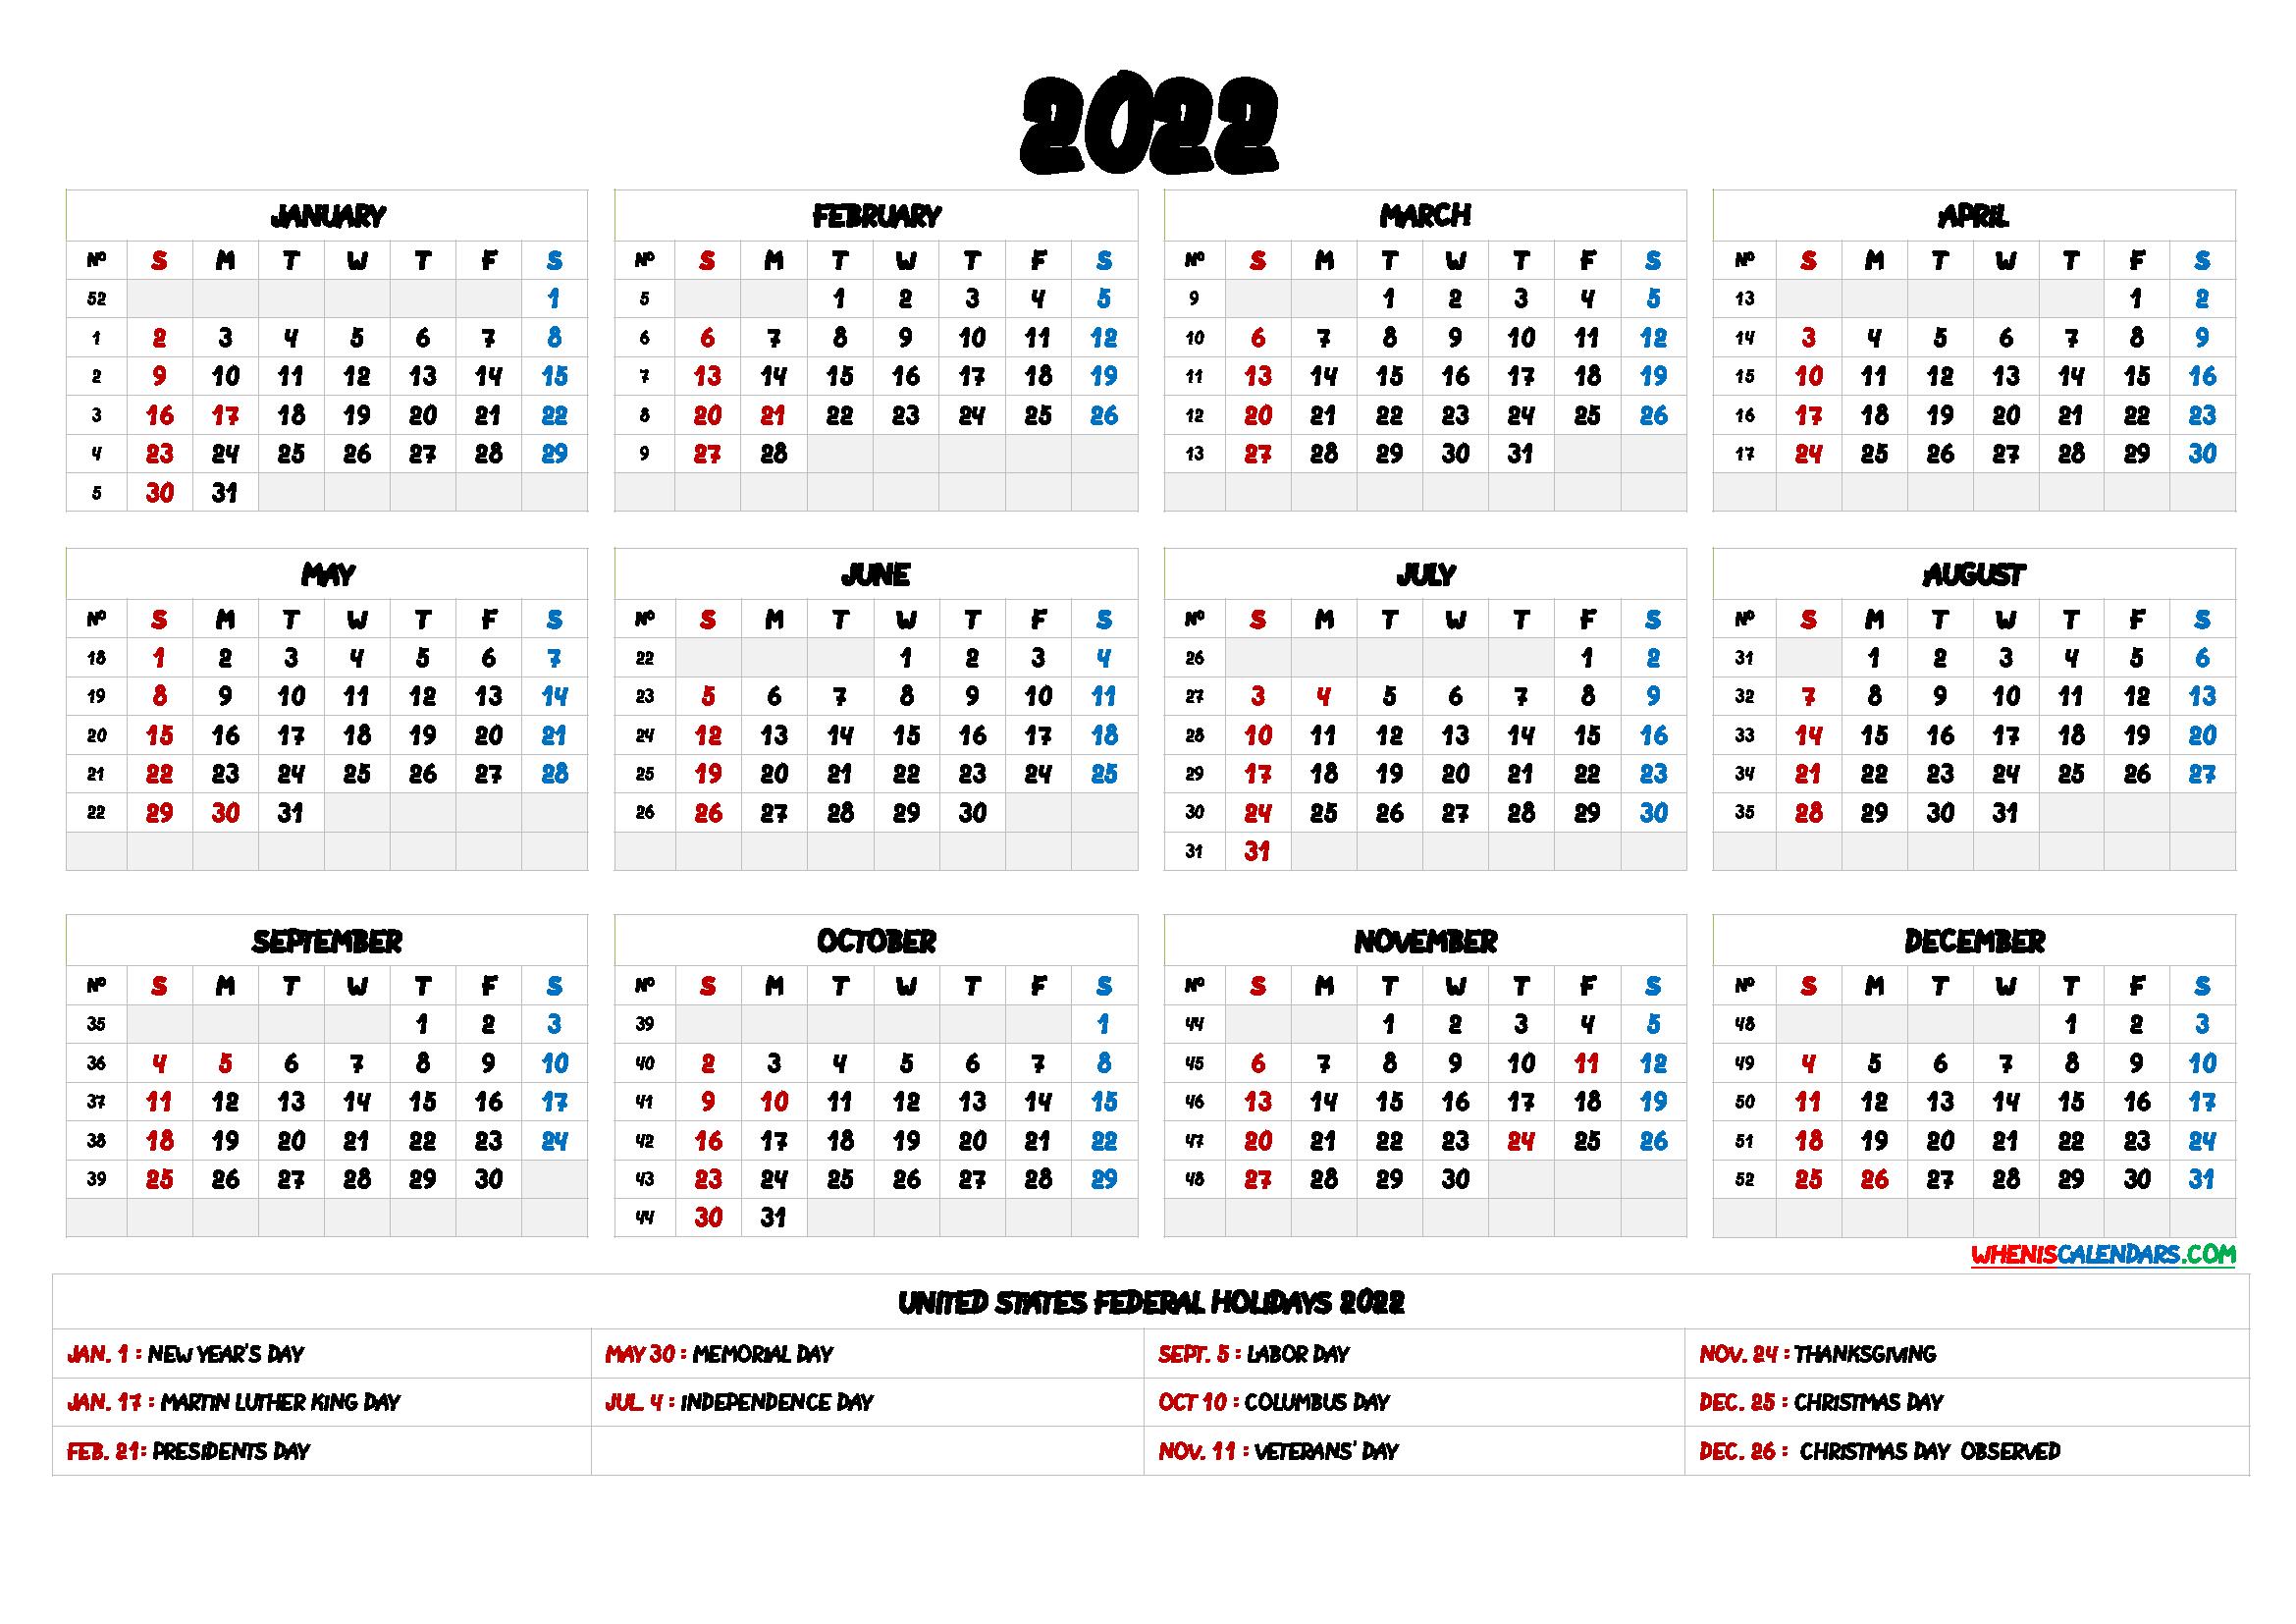 2022 One Page Calendar.2022 One Page Calendar Printable 6 Templates Calendar Printables Free Printable Calendar Printable Yearly Calendar